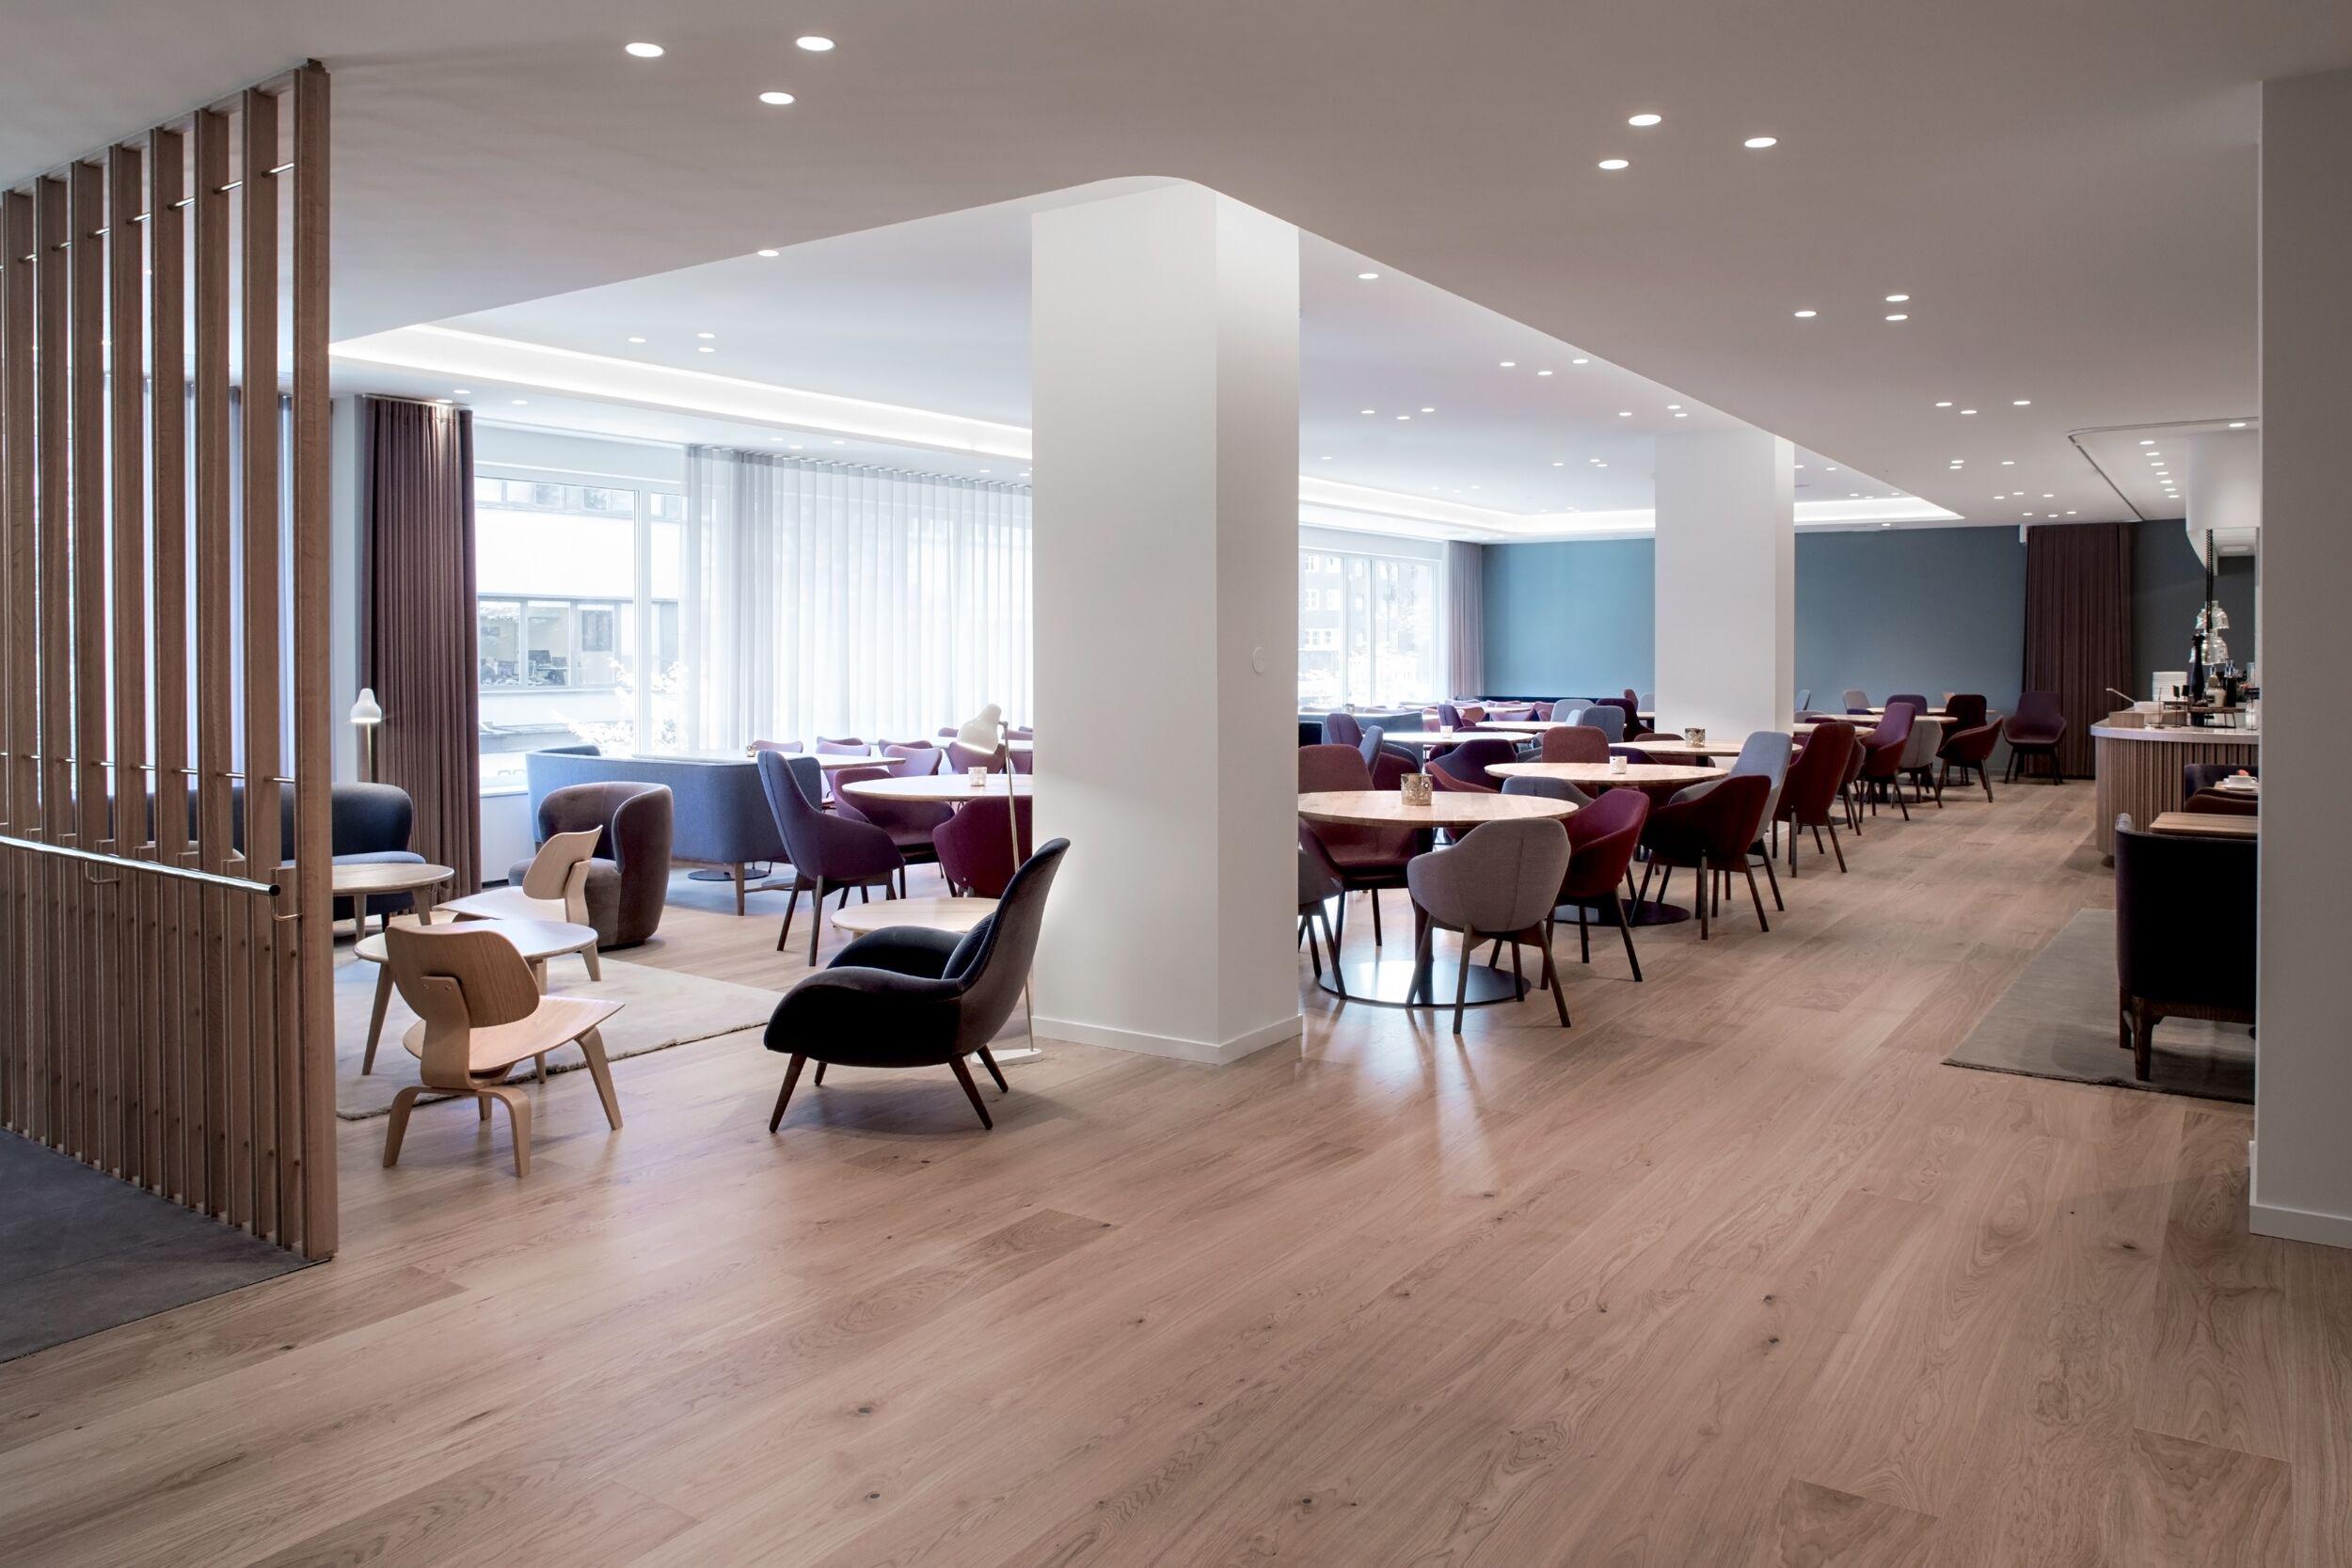 Restaurant Tivander lounge, scandinavian interior design and furniture